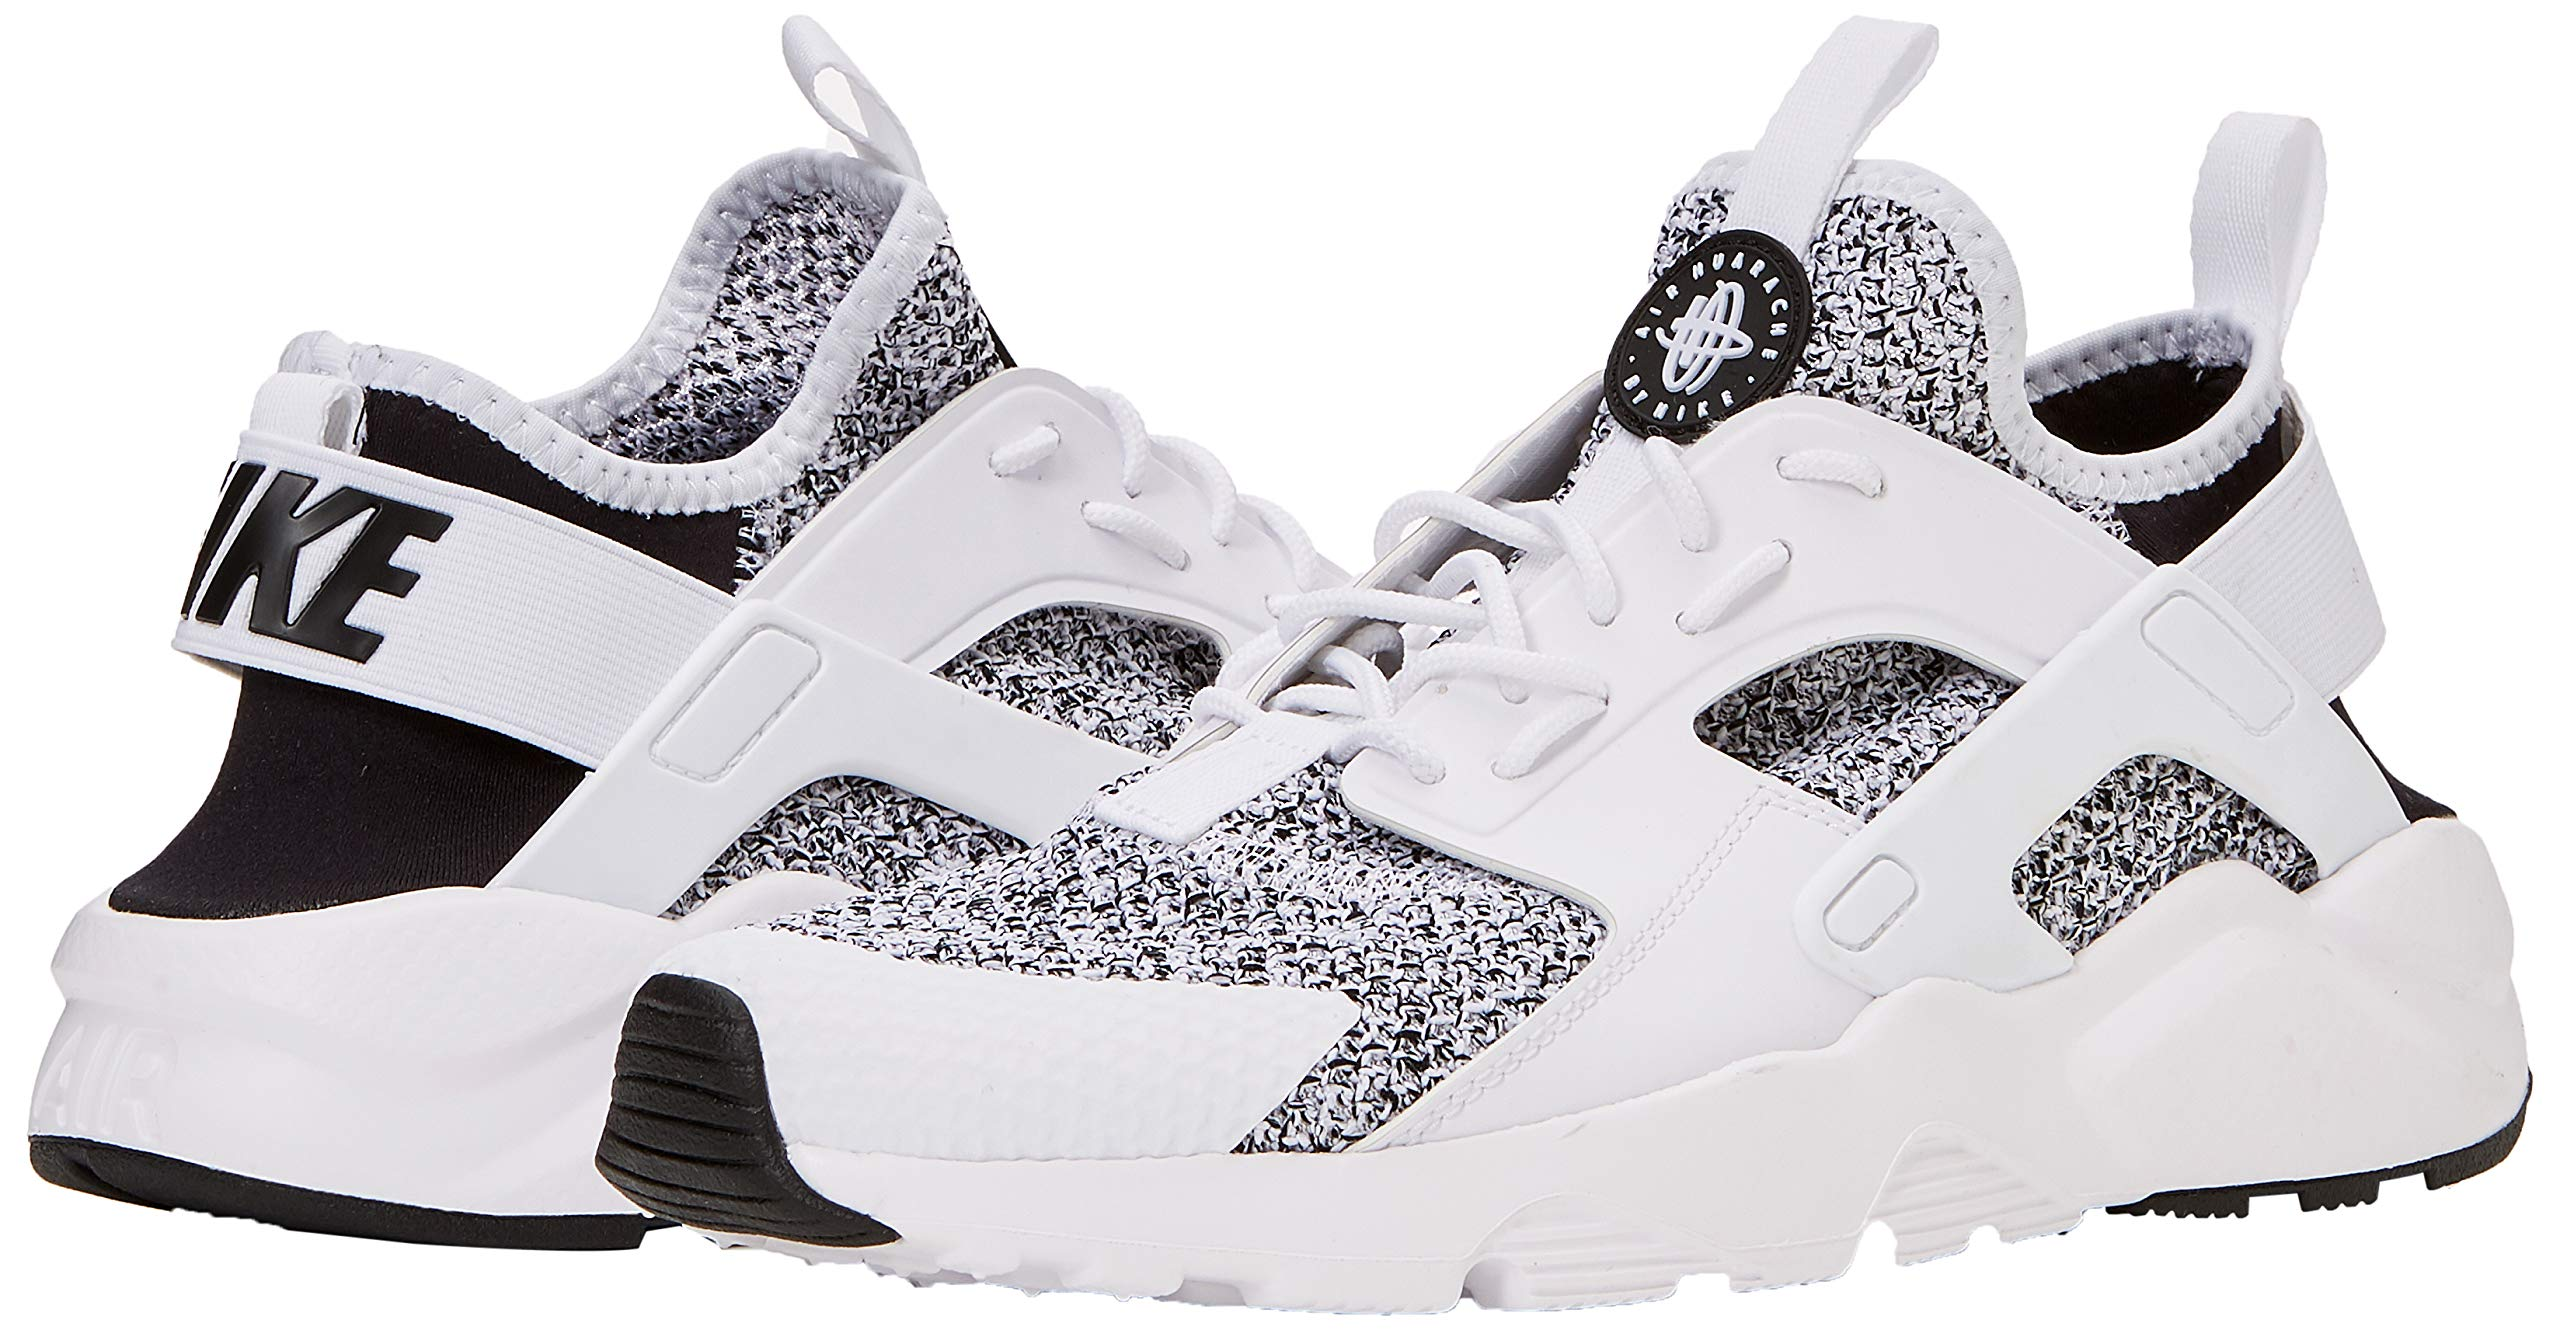 81npijMyzQL - Nike Men's Air Huarache Run Ultra Se Gymnastics Shoes